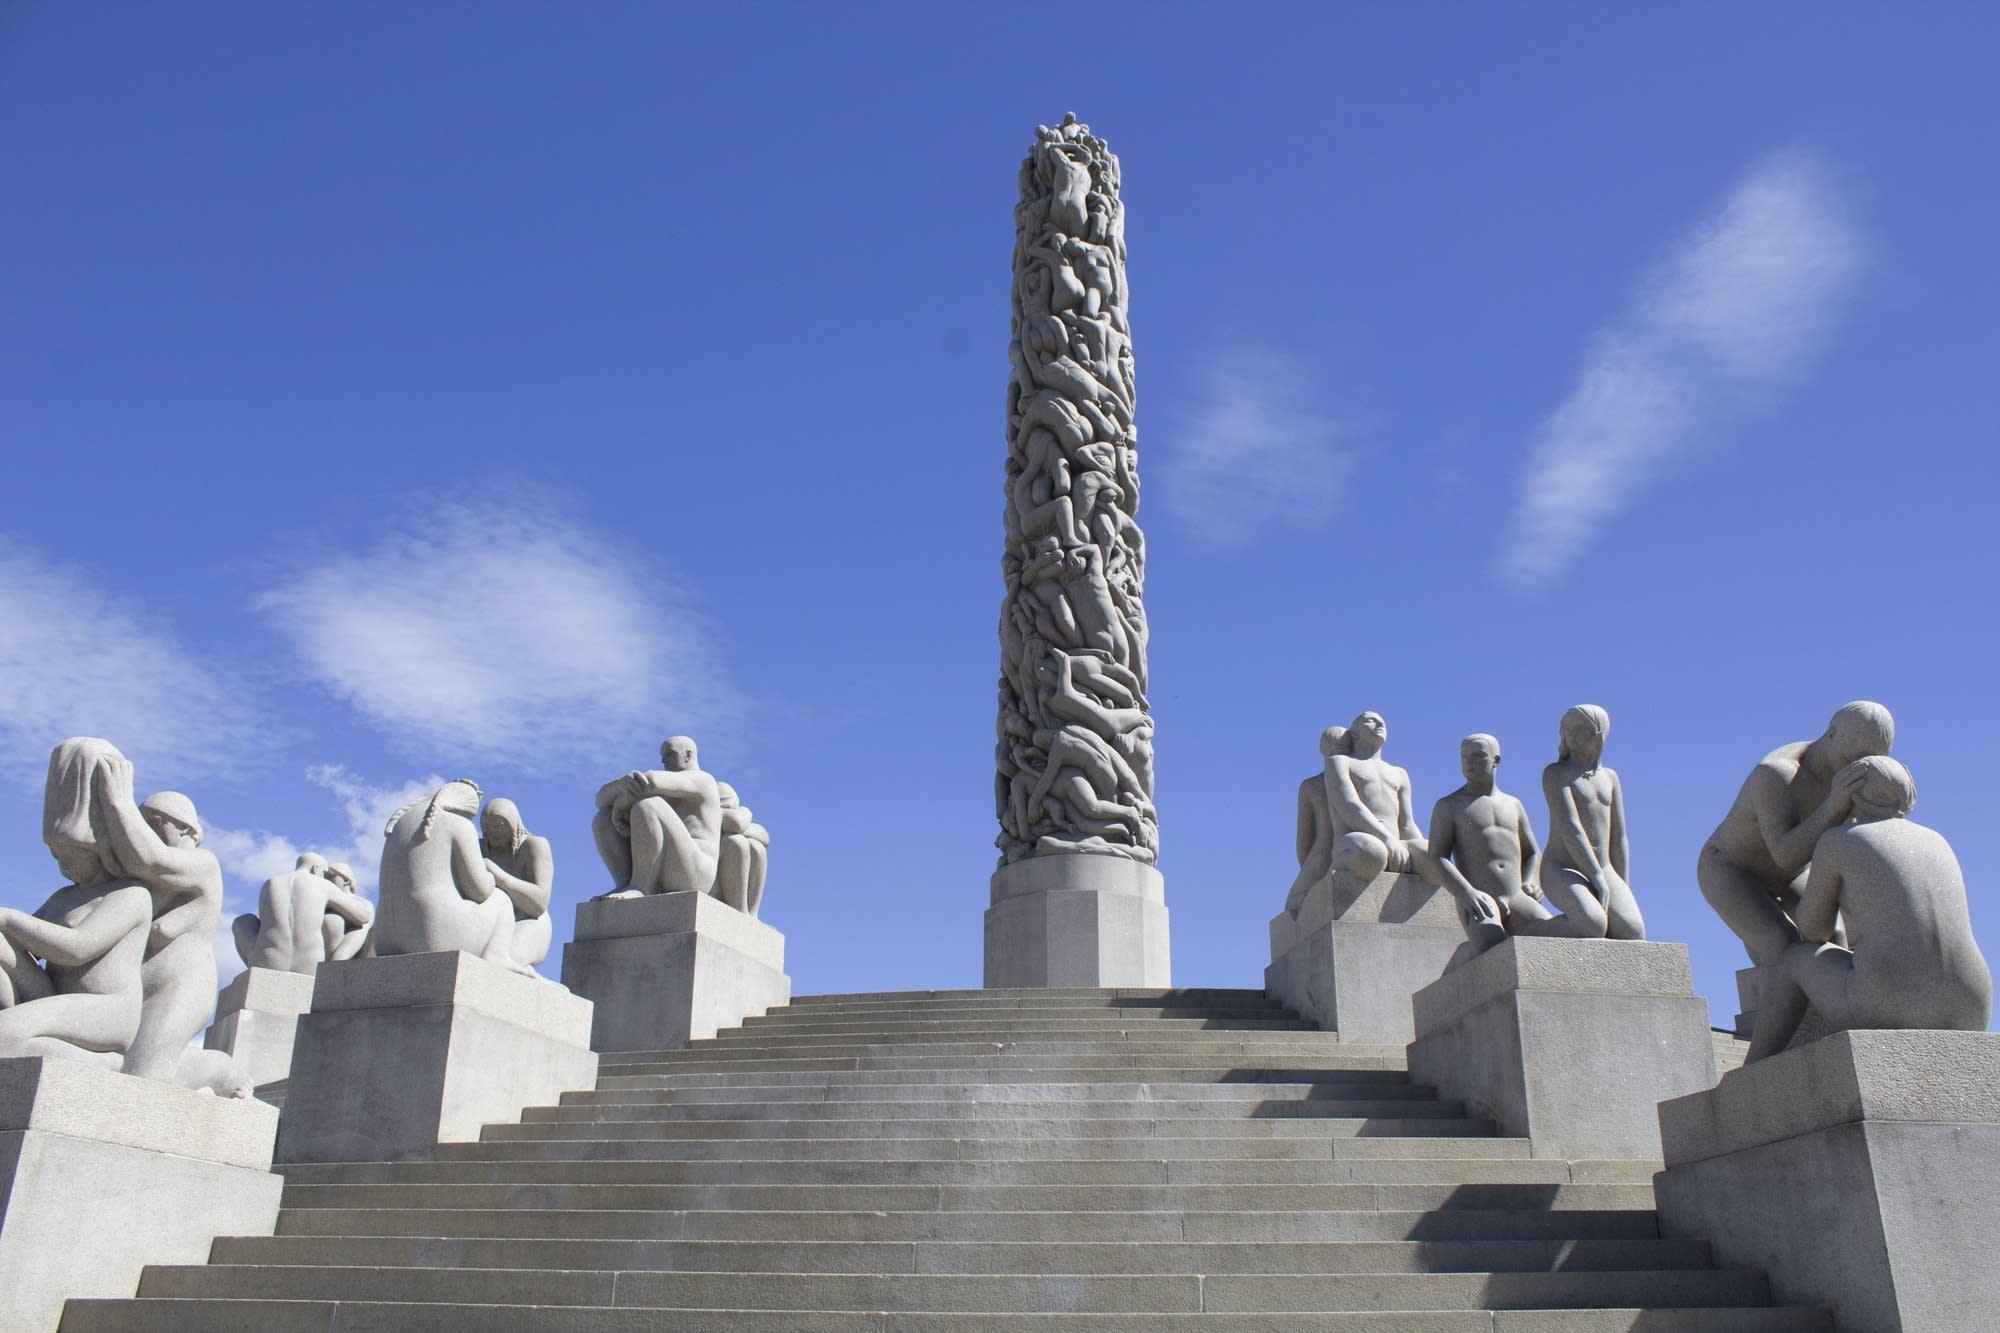 Oslo - 15 - sculpture park 3